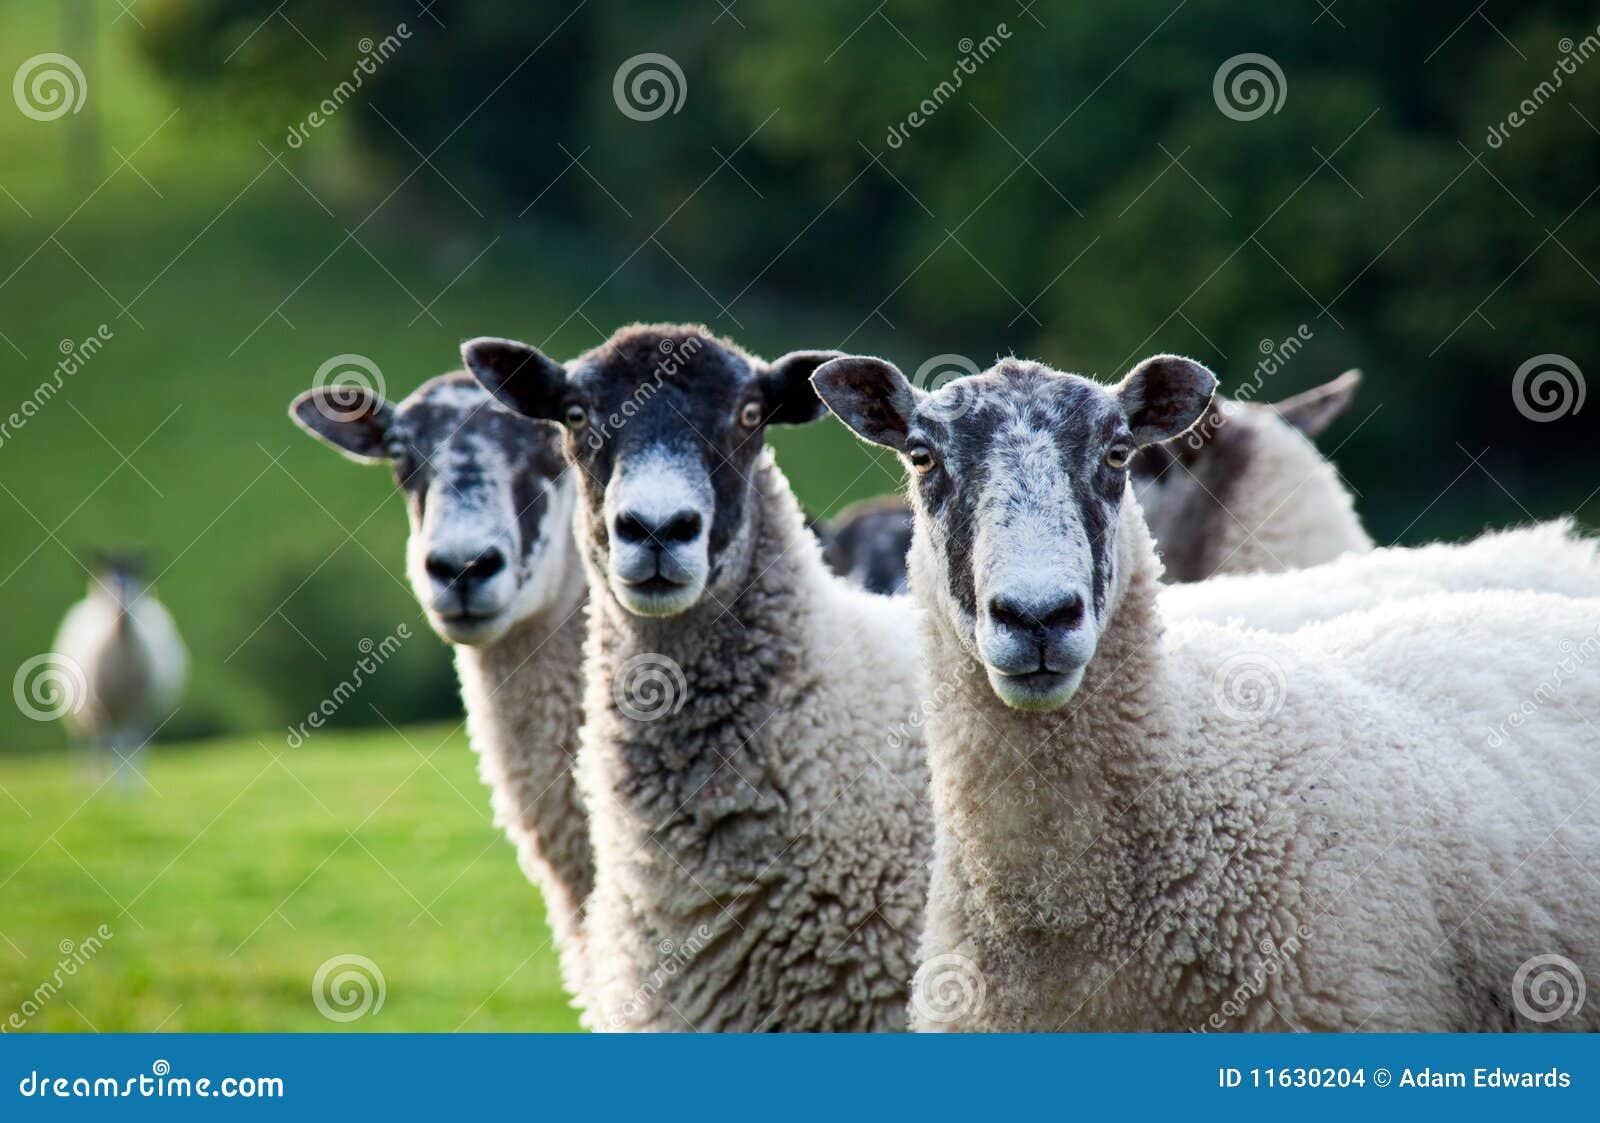 Three sheep - photo#7